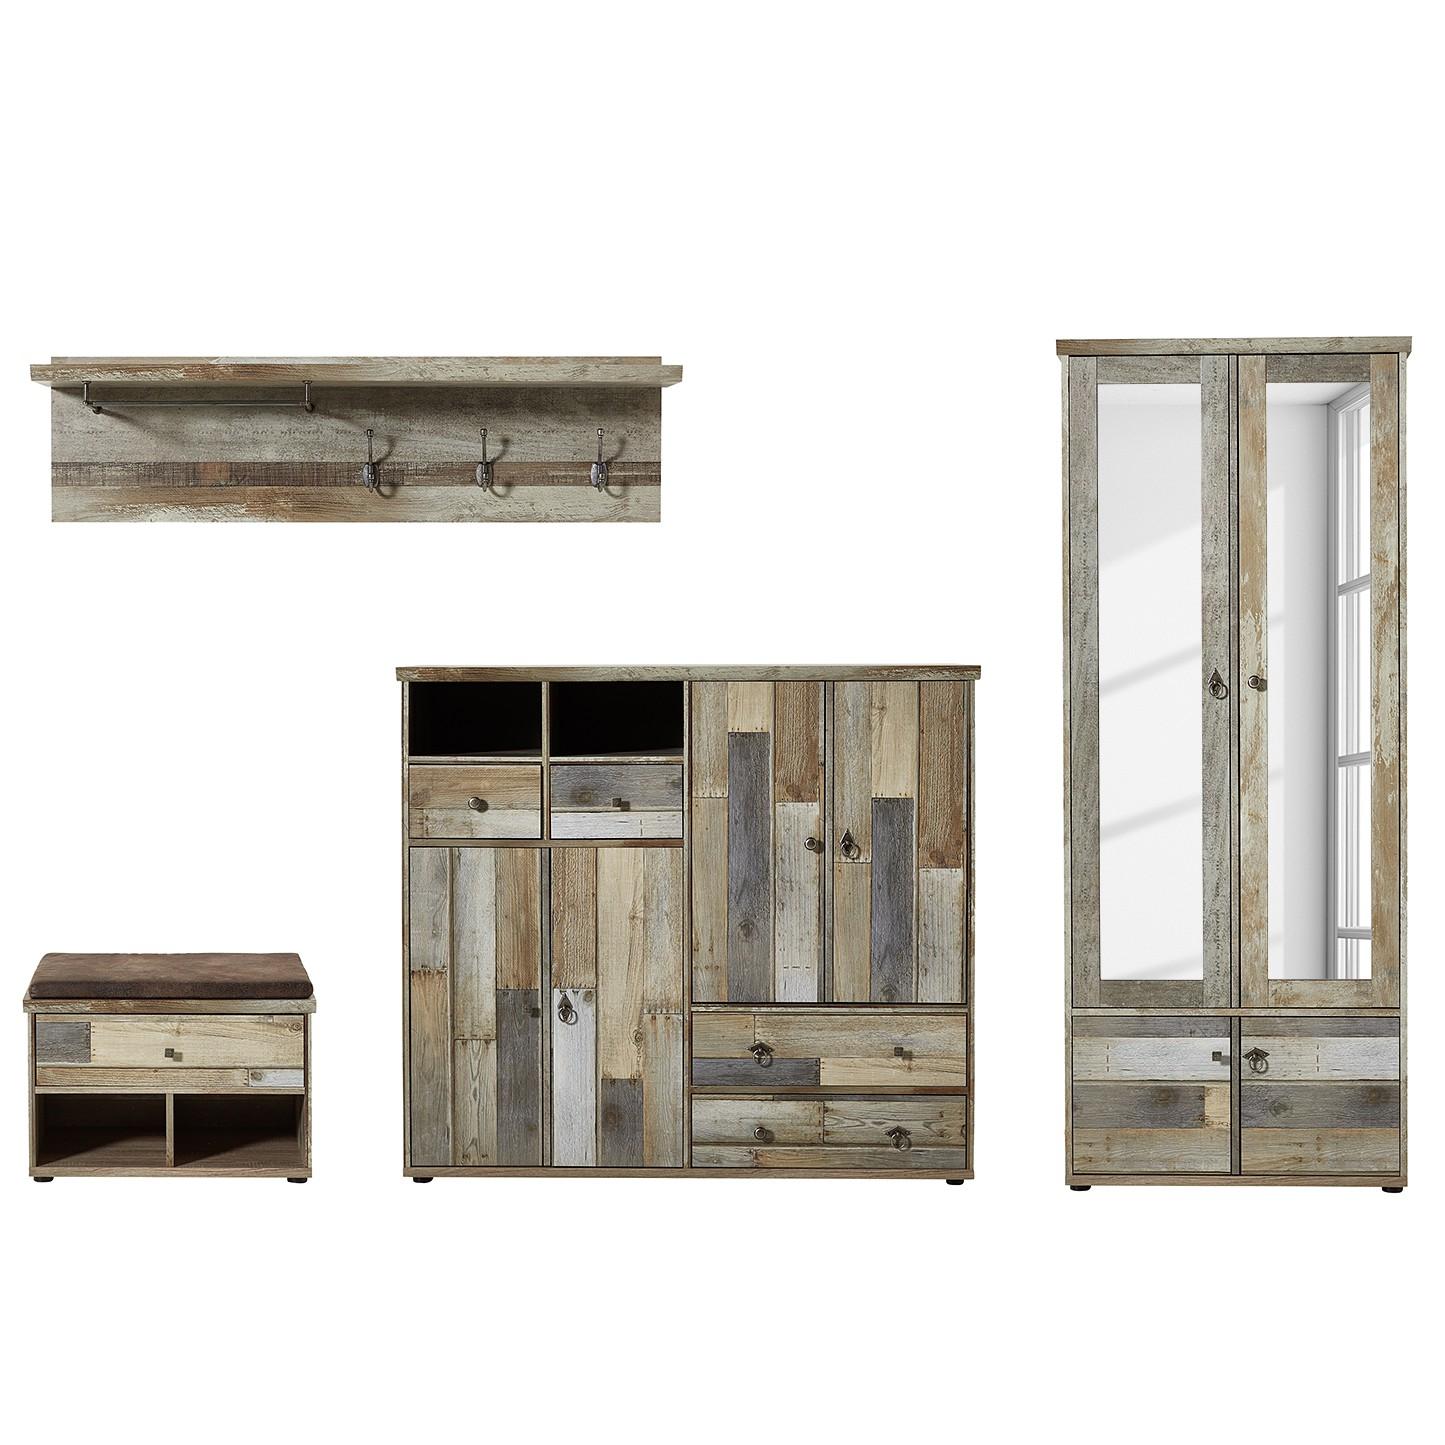 schrank tapara braun grau roomscape m bel preiswert. Black Bedroom Furniture Sets. Home Design Ideas